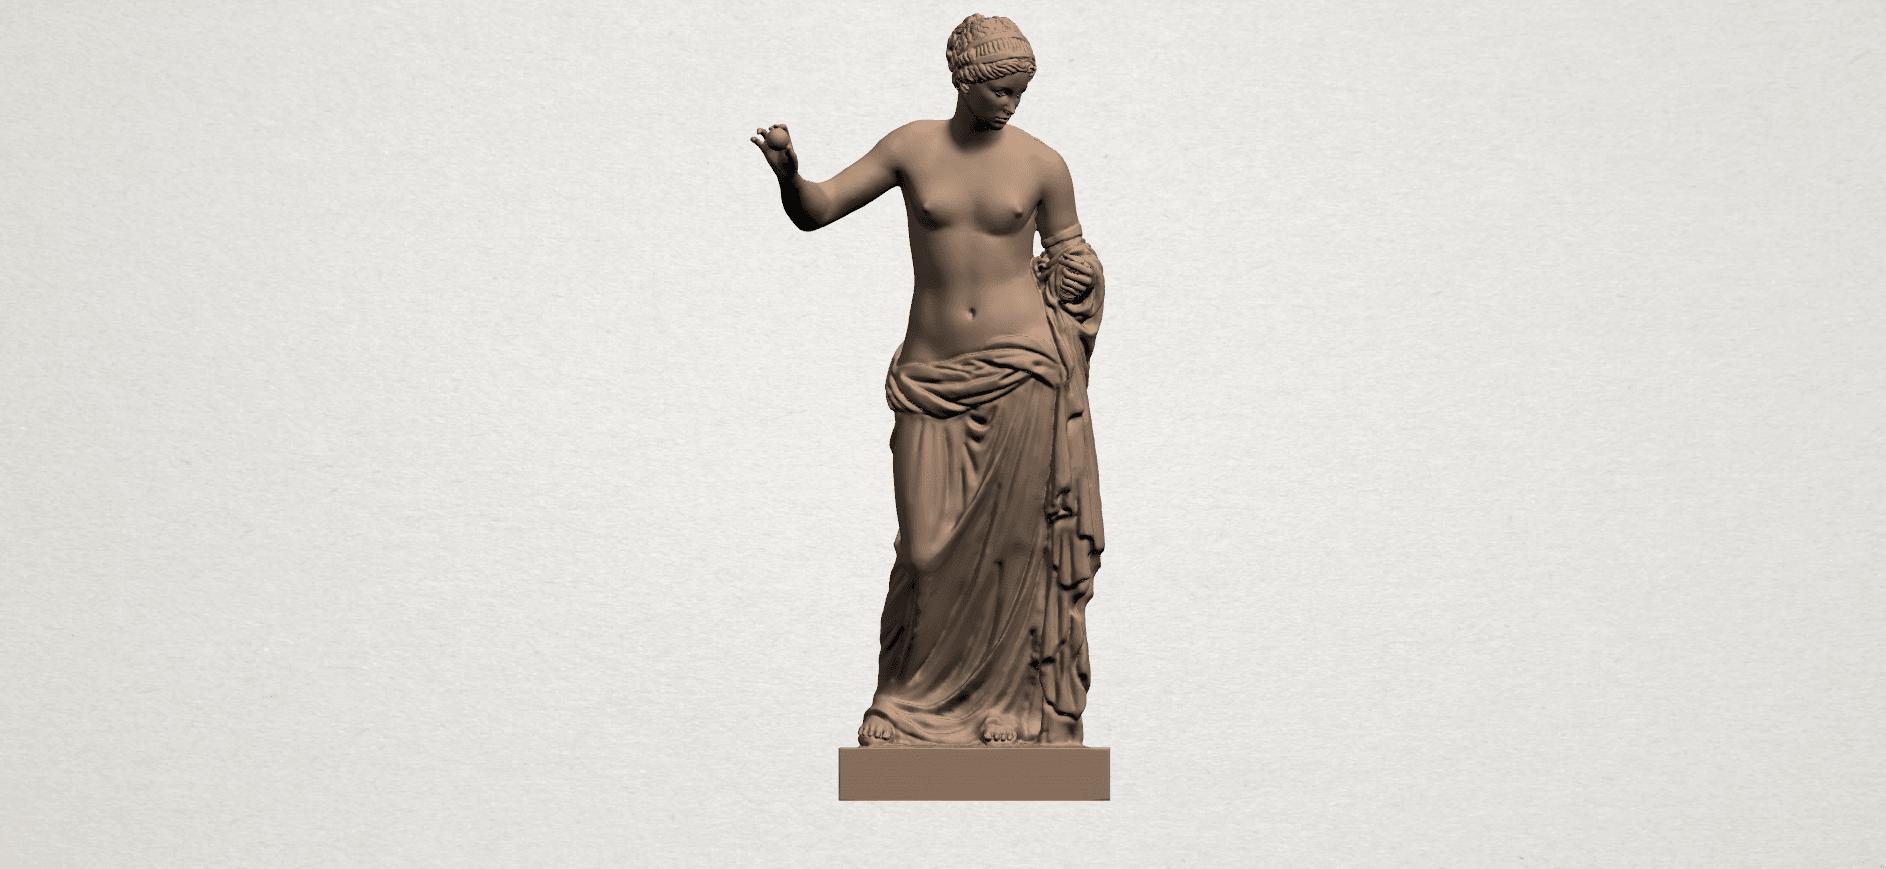 Naked Girl (xiv) A01.png Download free STL file Naked Girl 14 • 3D printer design, GeorgesNikkei